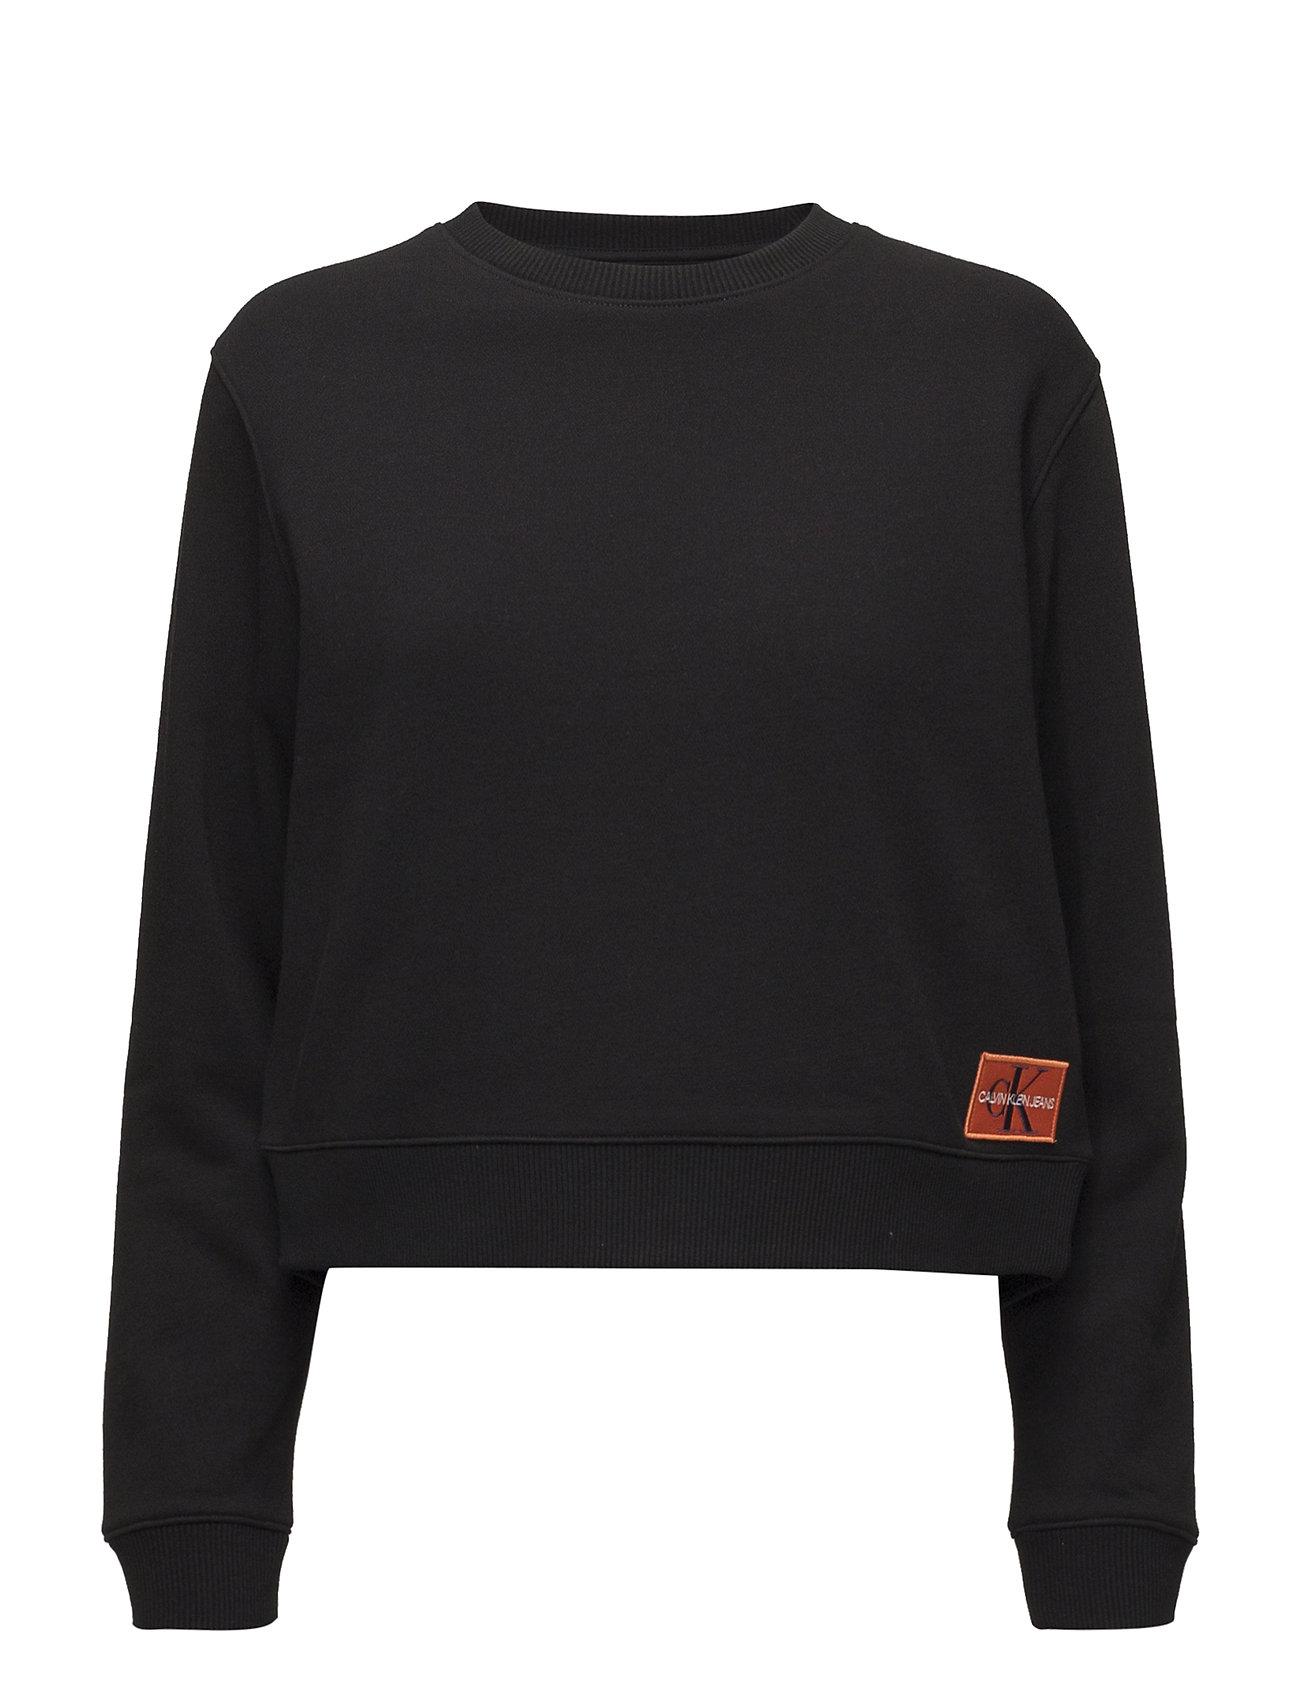 Calvin Klein Jeans MONOGRAM BADGE RELAX - CK BLACK / PUMPKIN RED